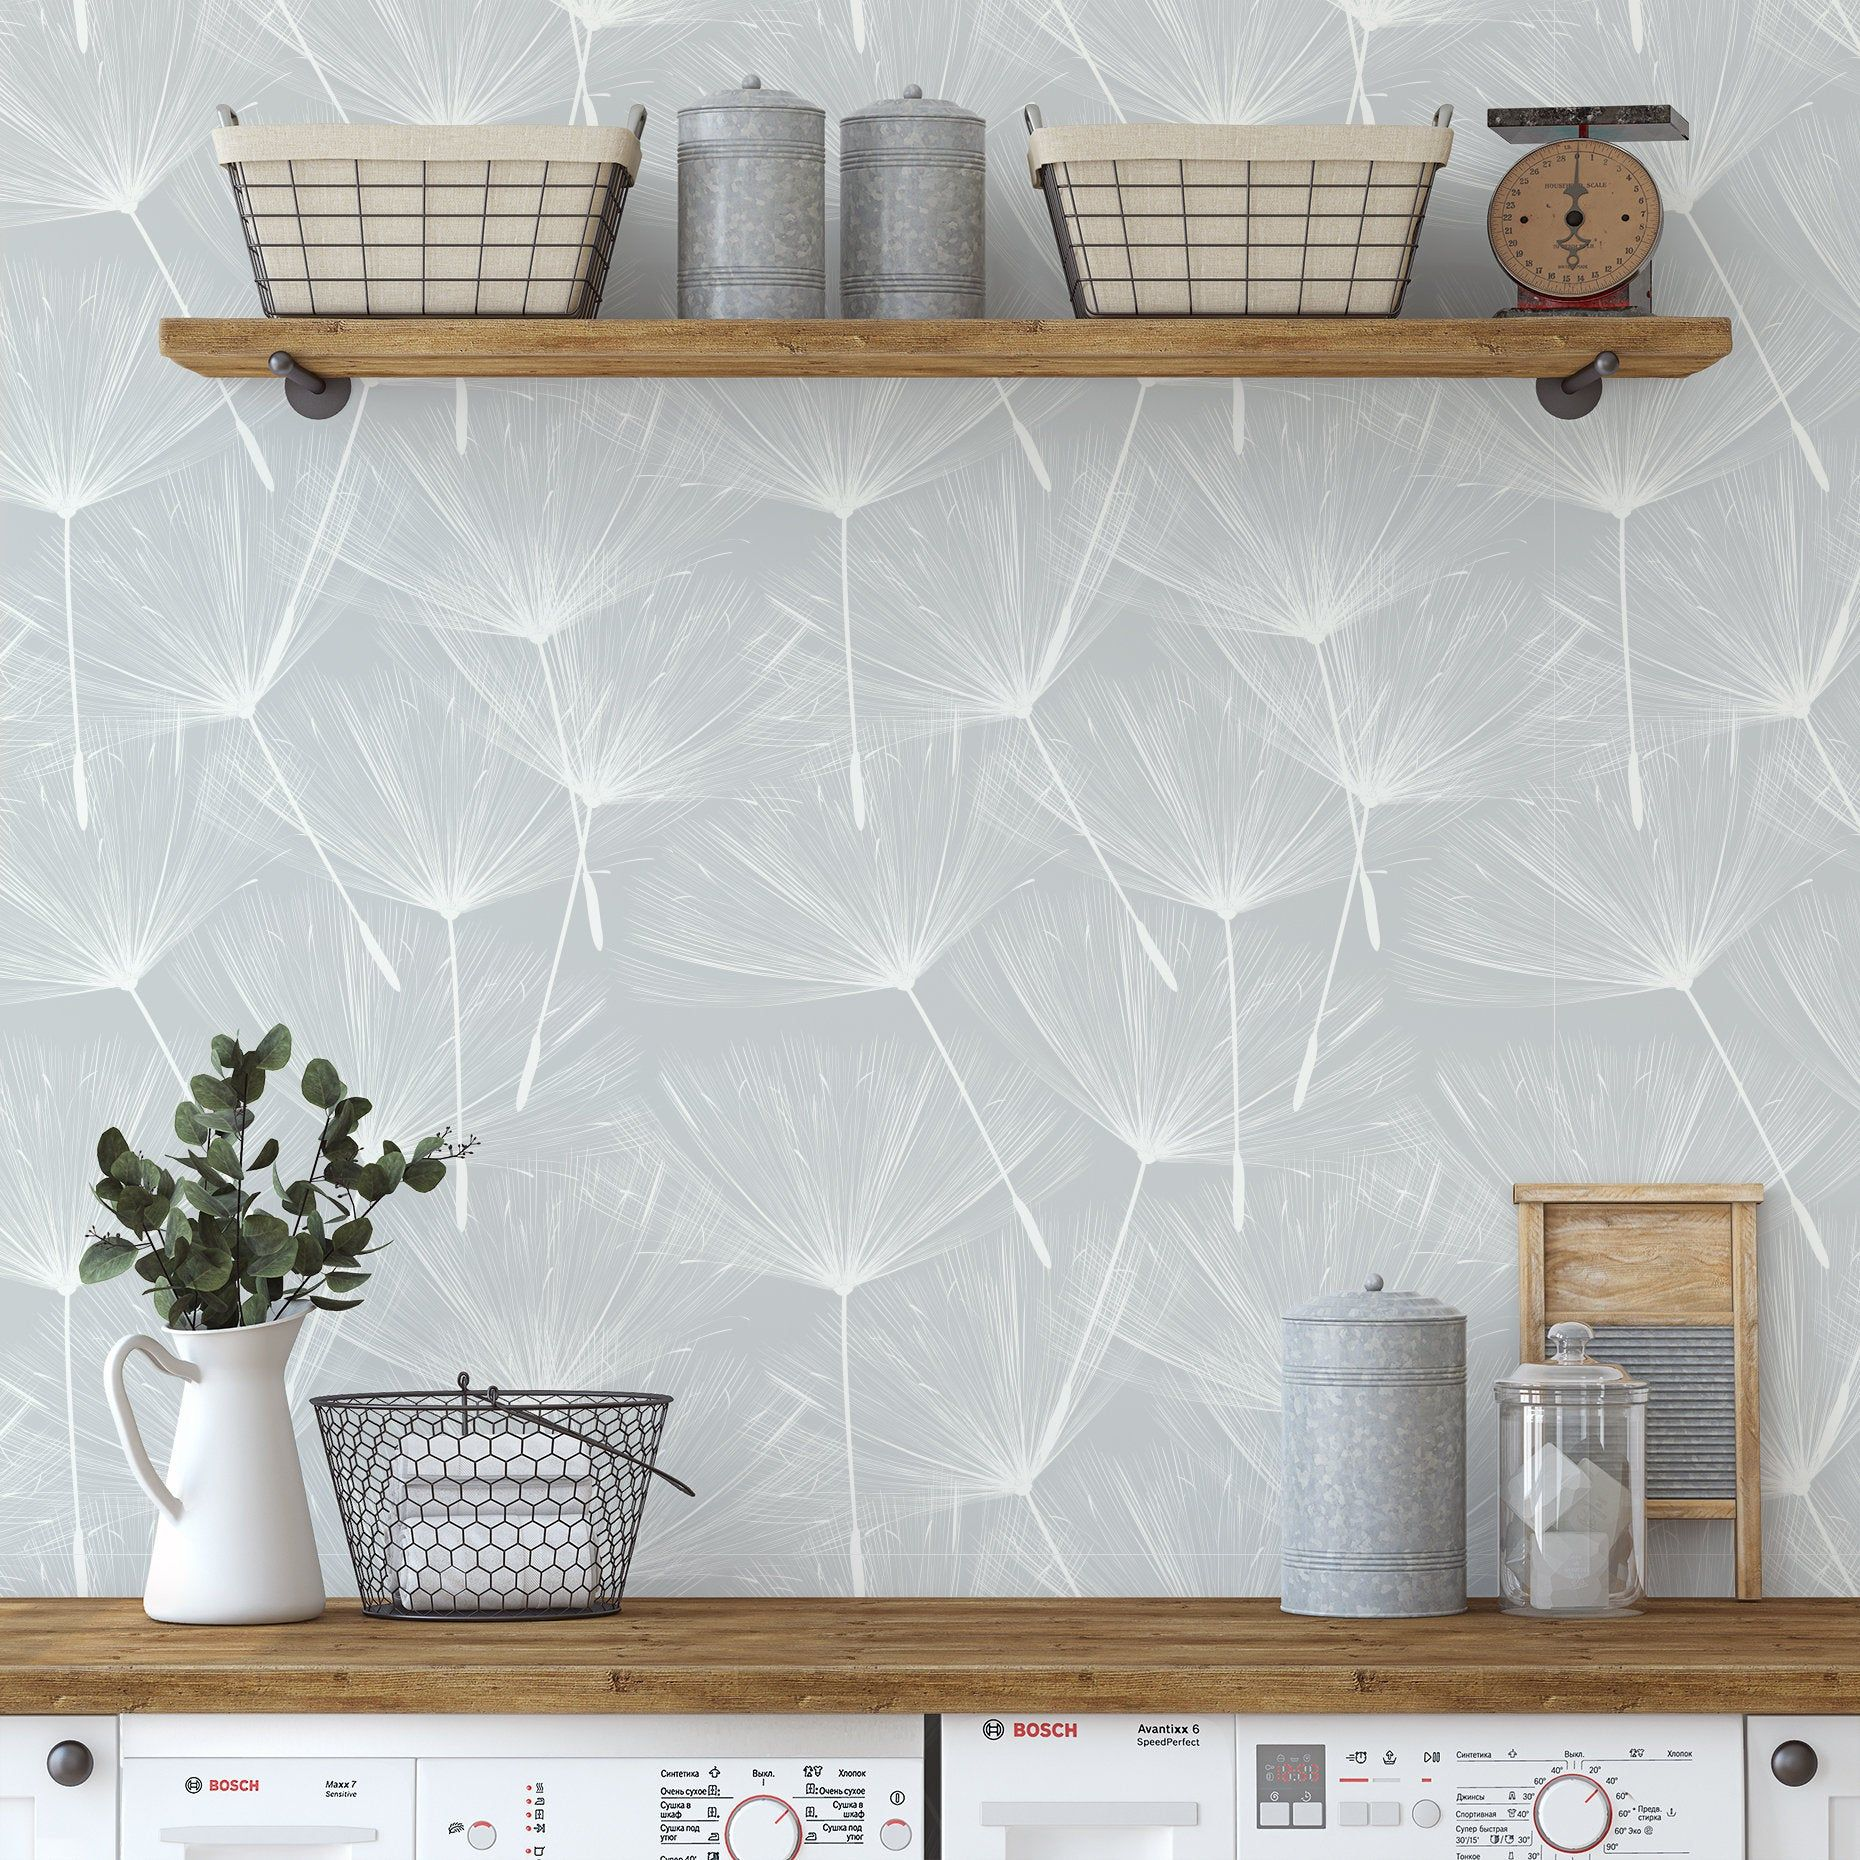 Peel And Stick Wallpaper Self Adhesive Wallpaper Wall Decor Etsy Peel And Stick Wallpaper Wallpaper Walls Decor Self Adhesive Wallpaper